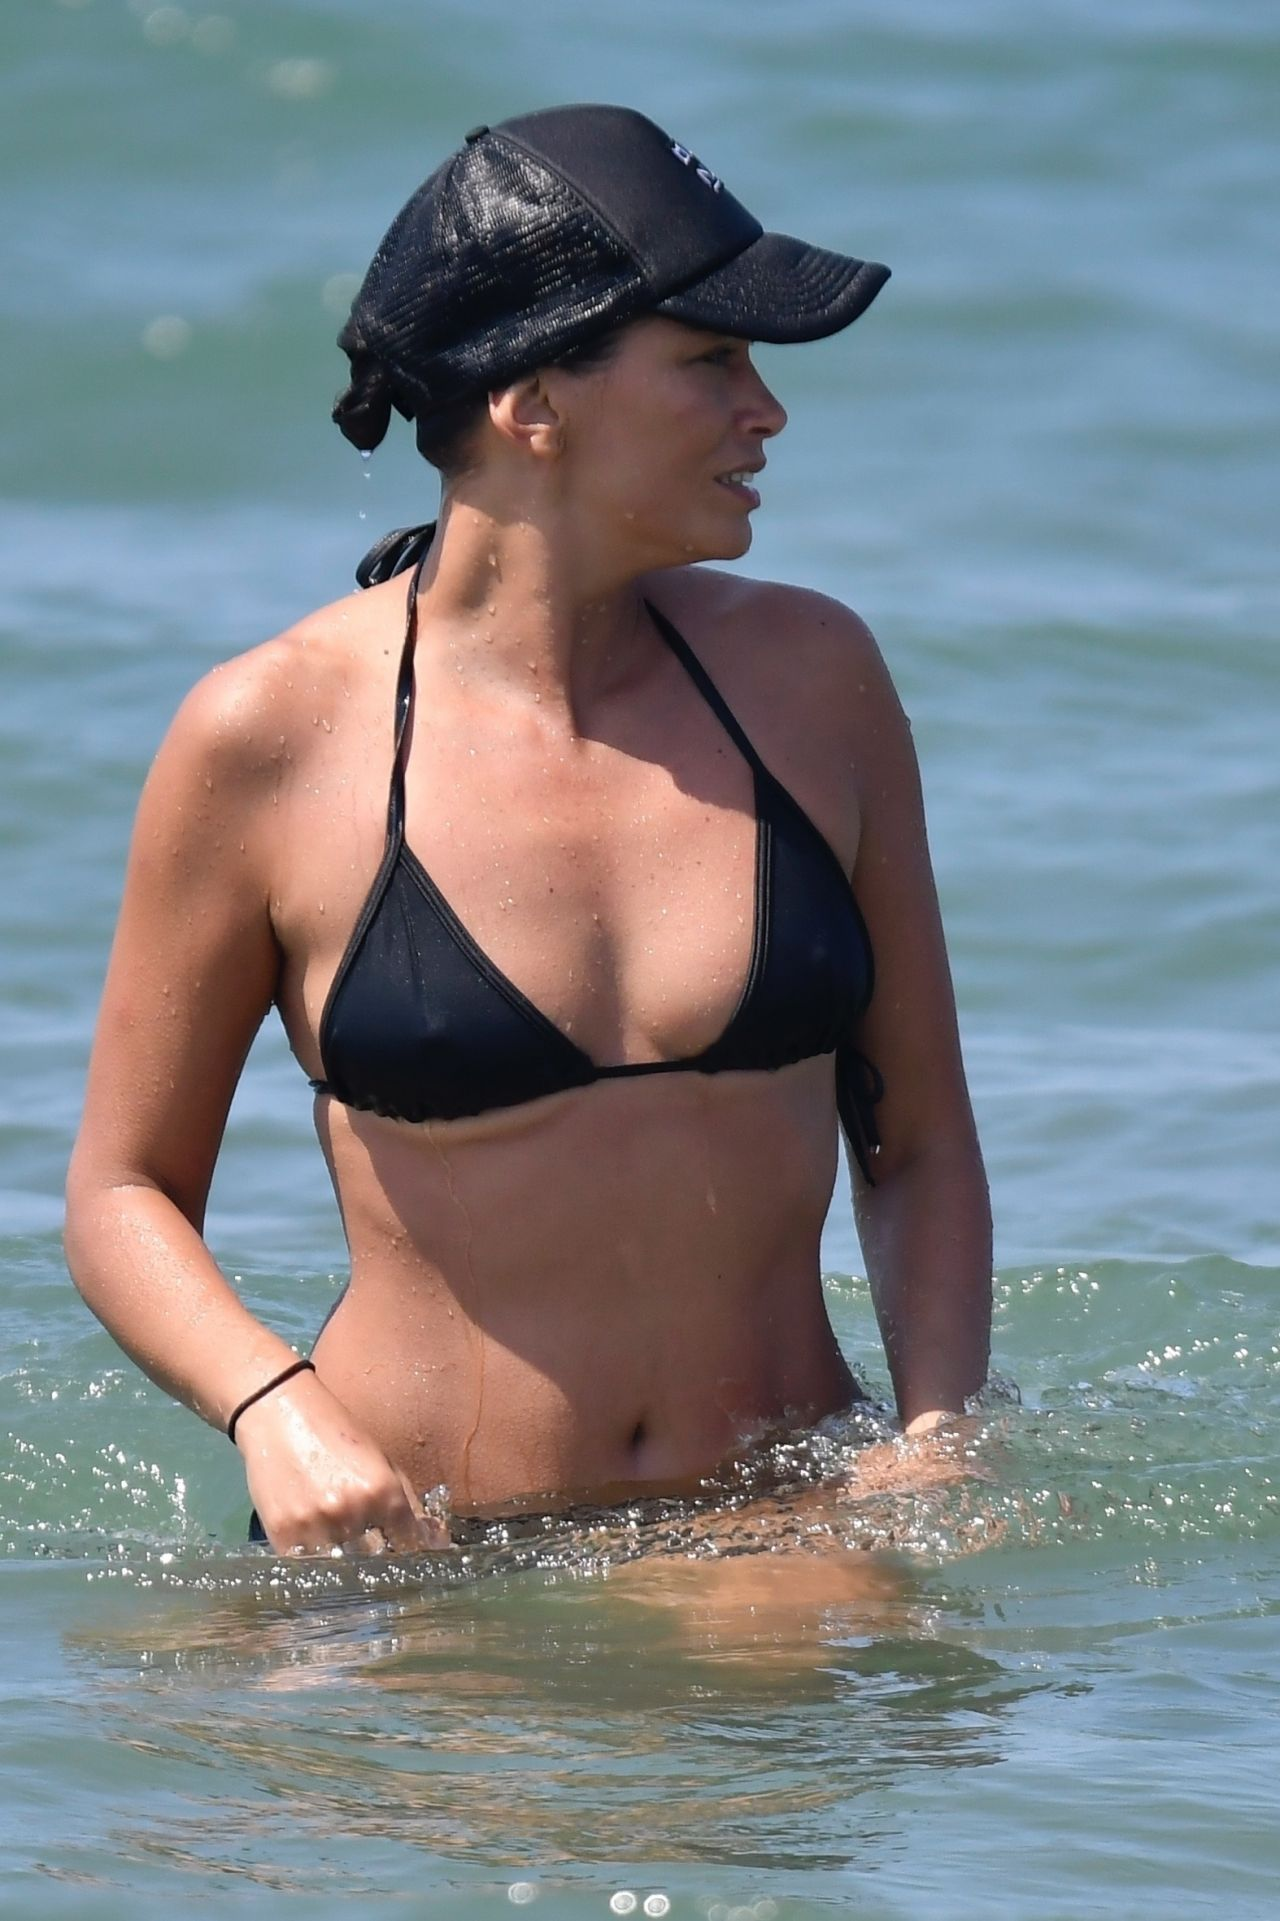 Celebrites Fernanda Lessa nude (72 foto and video), Tits, Paparazzi, Feet, butt 2006